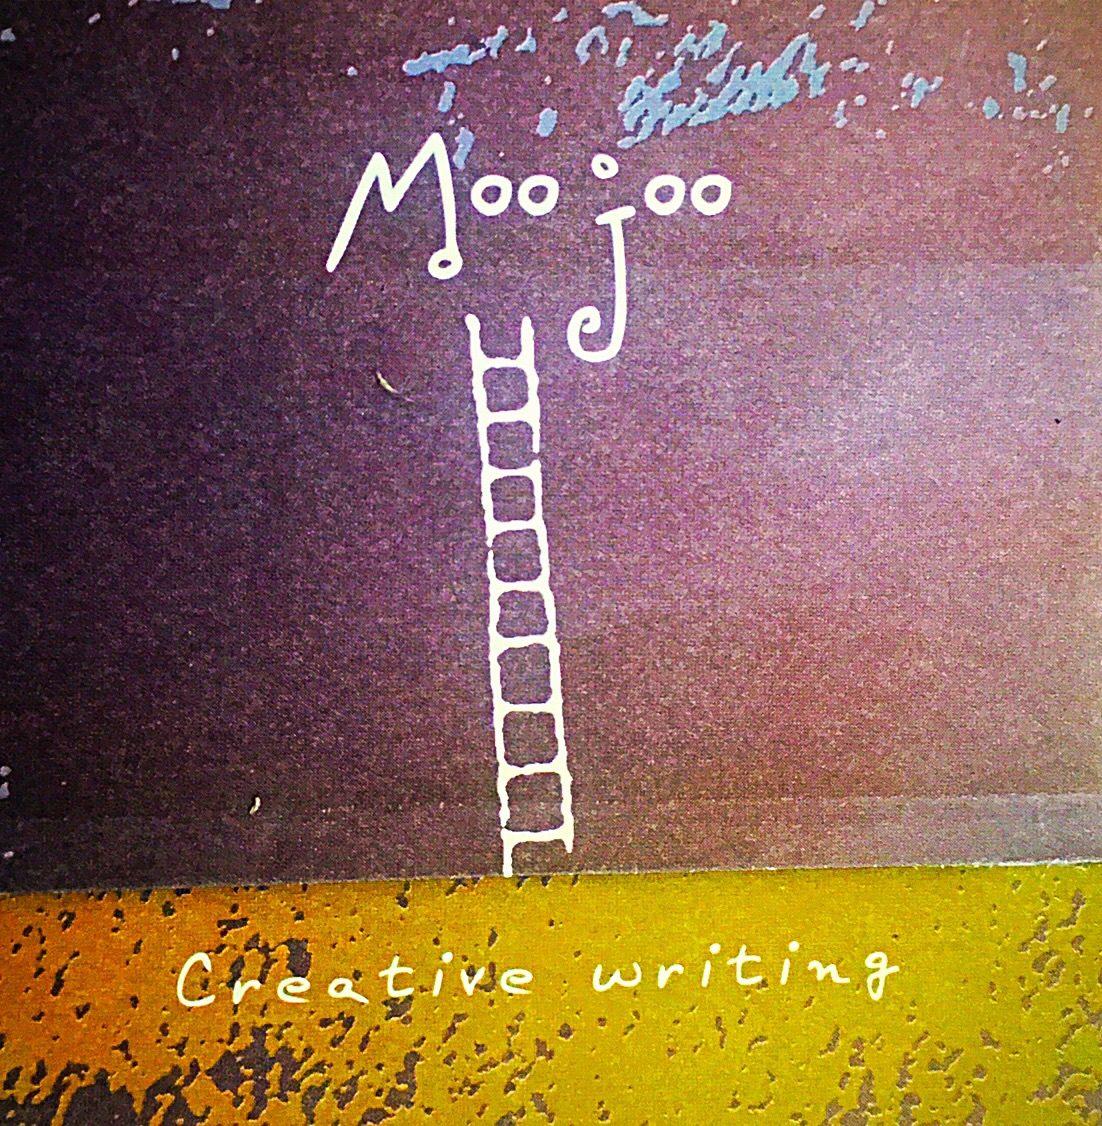 MooJoo Creative Writing